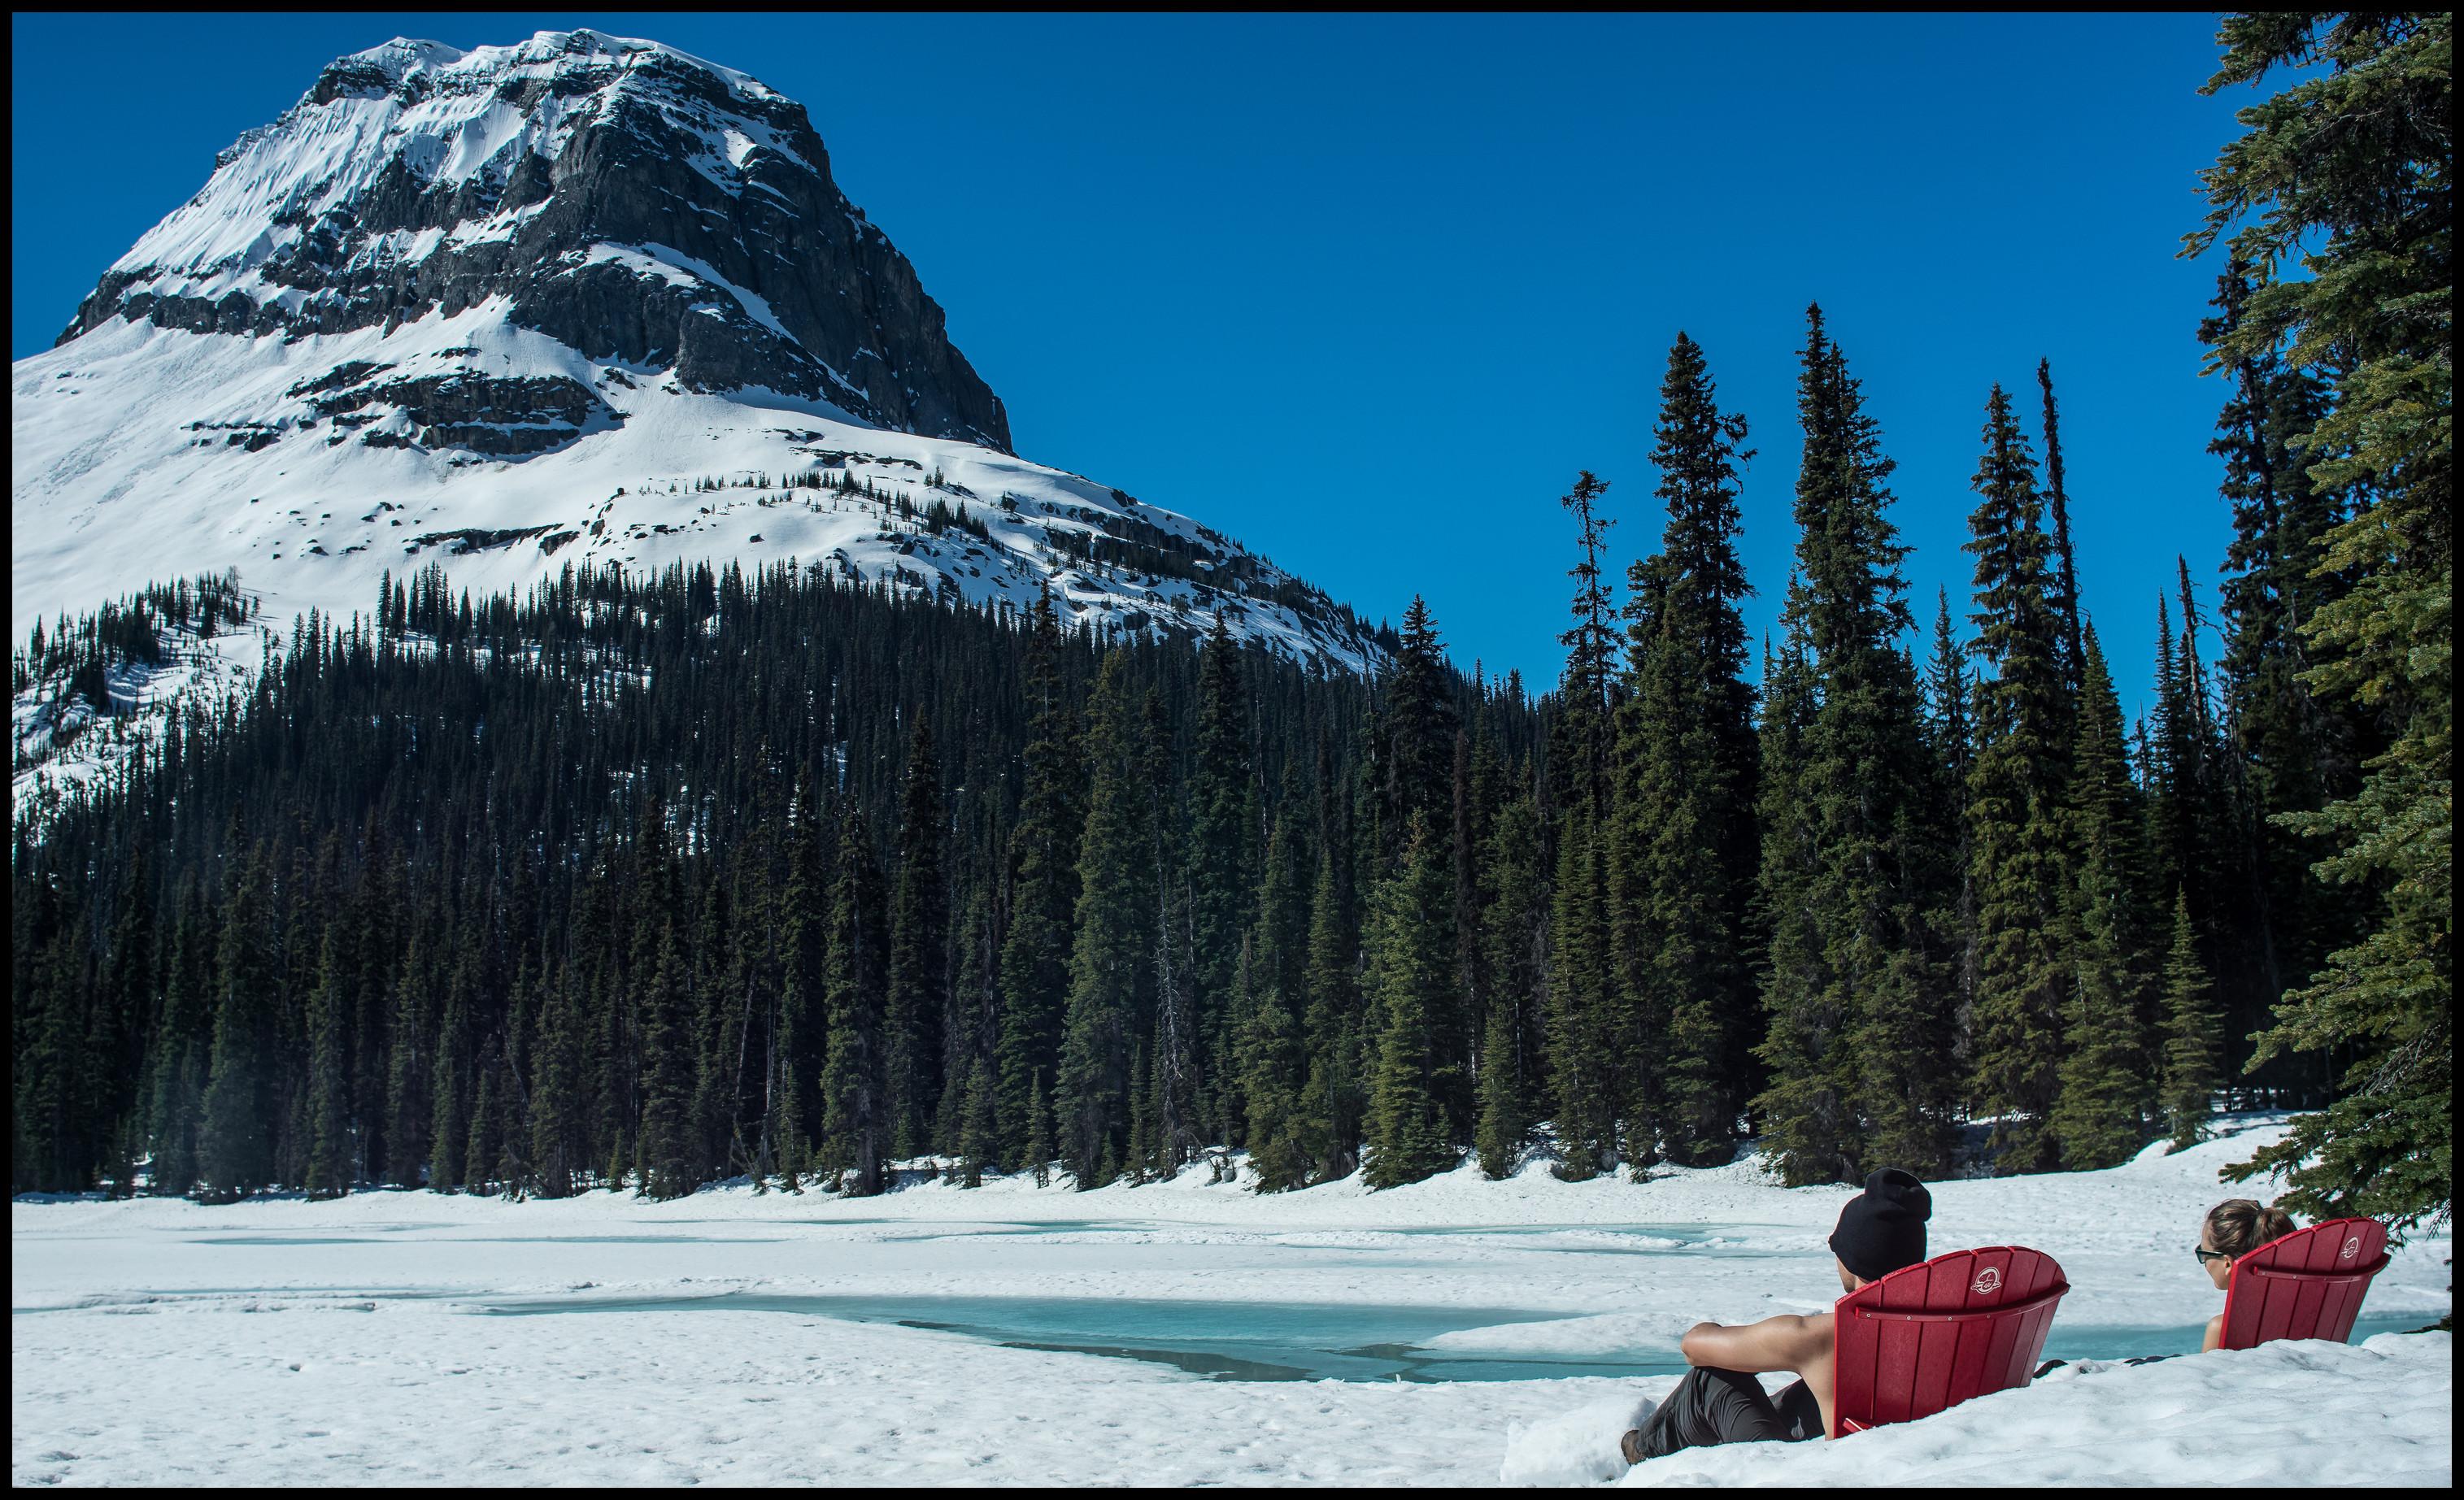 Red chair view, Yoho Lake Winter Camping